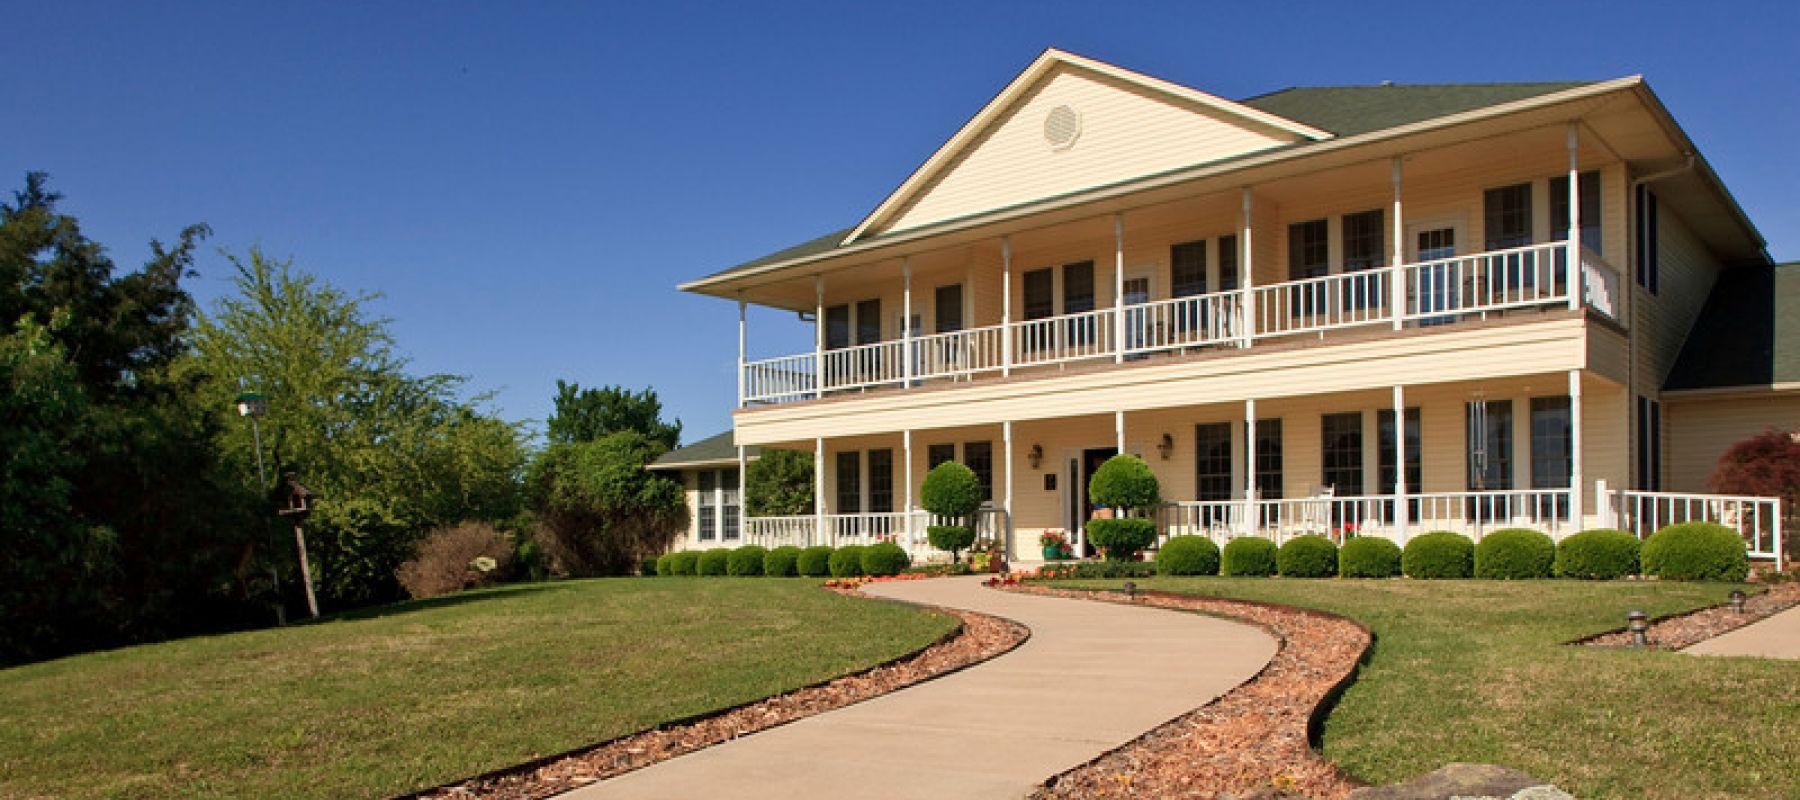 A Premier Oklahoma Romantic Getaway Bed and Breakfast